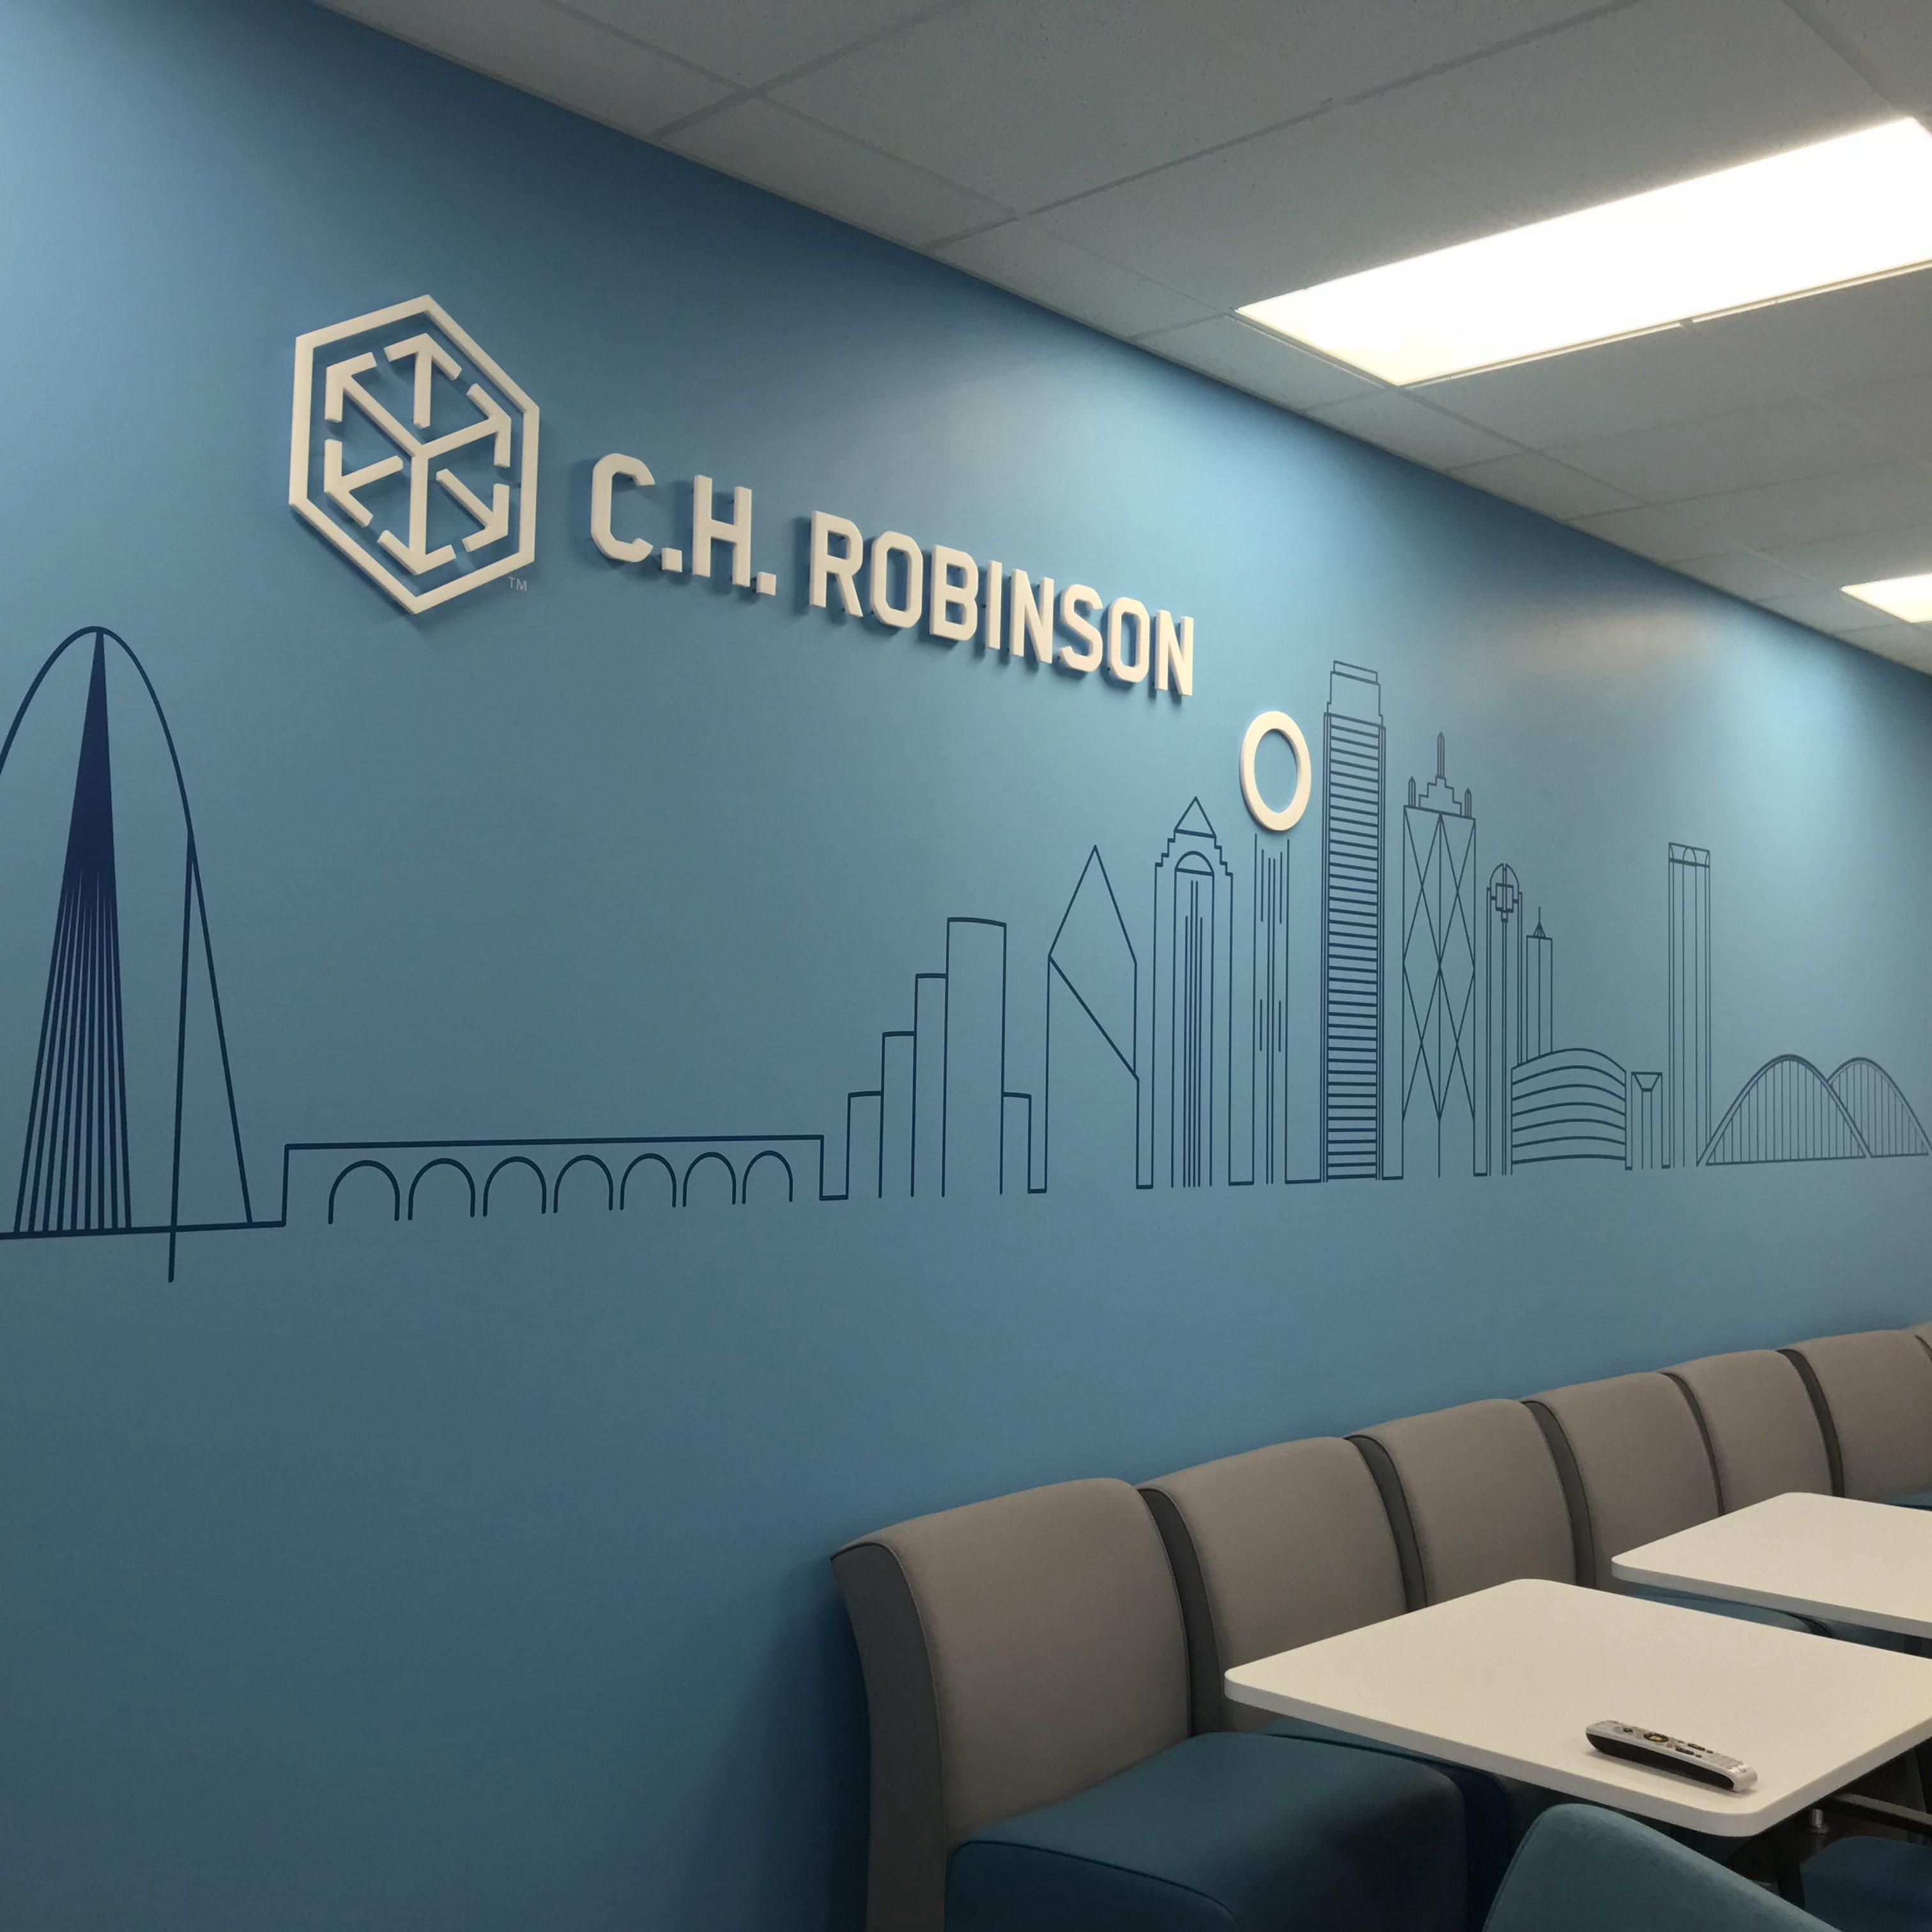 Cafeteria Mural in CH Robinson